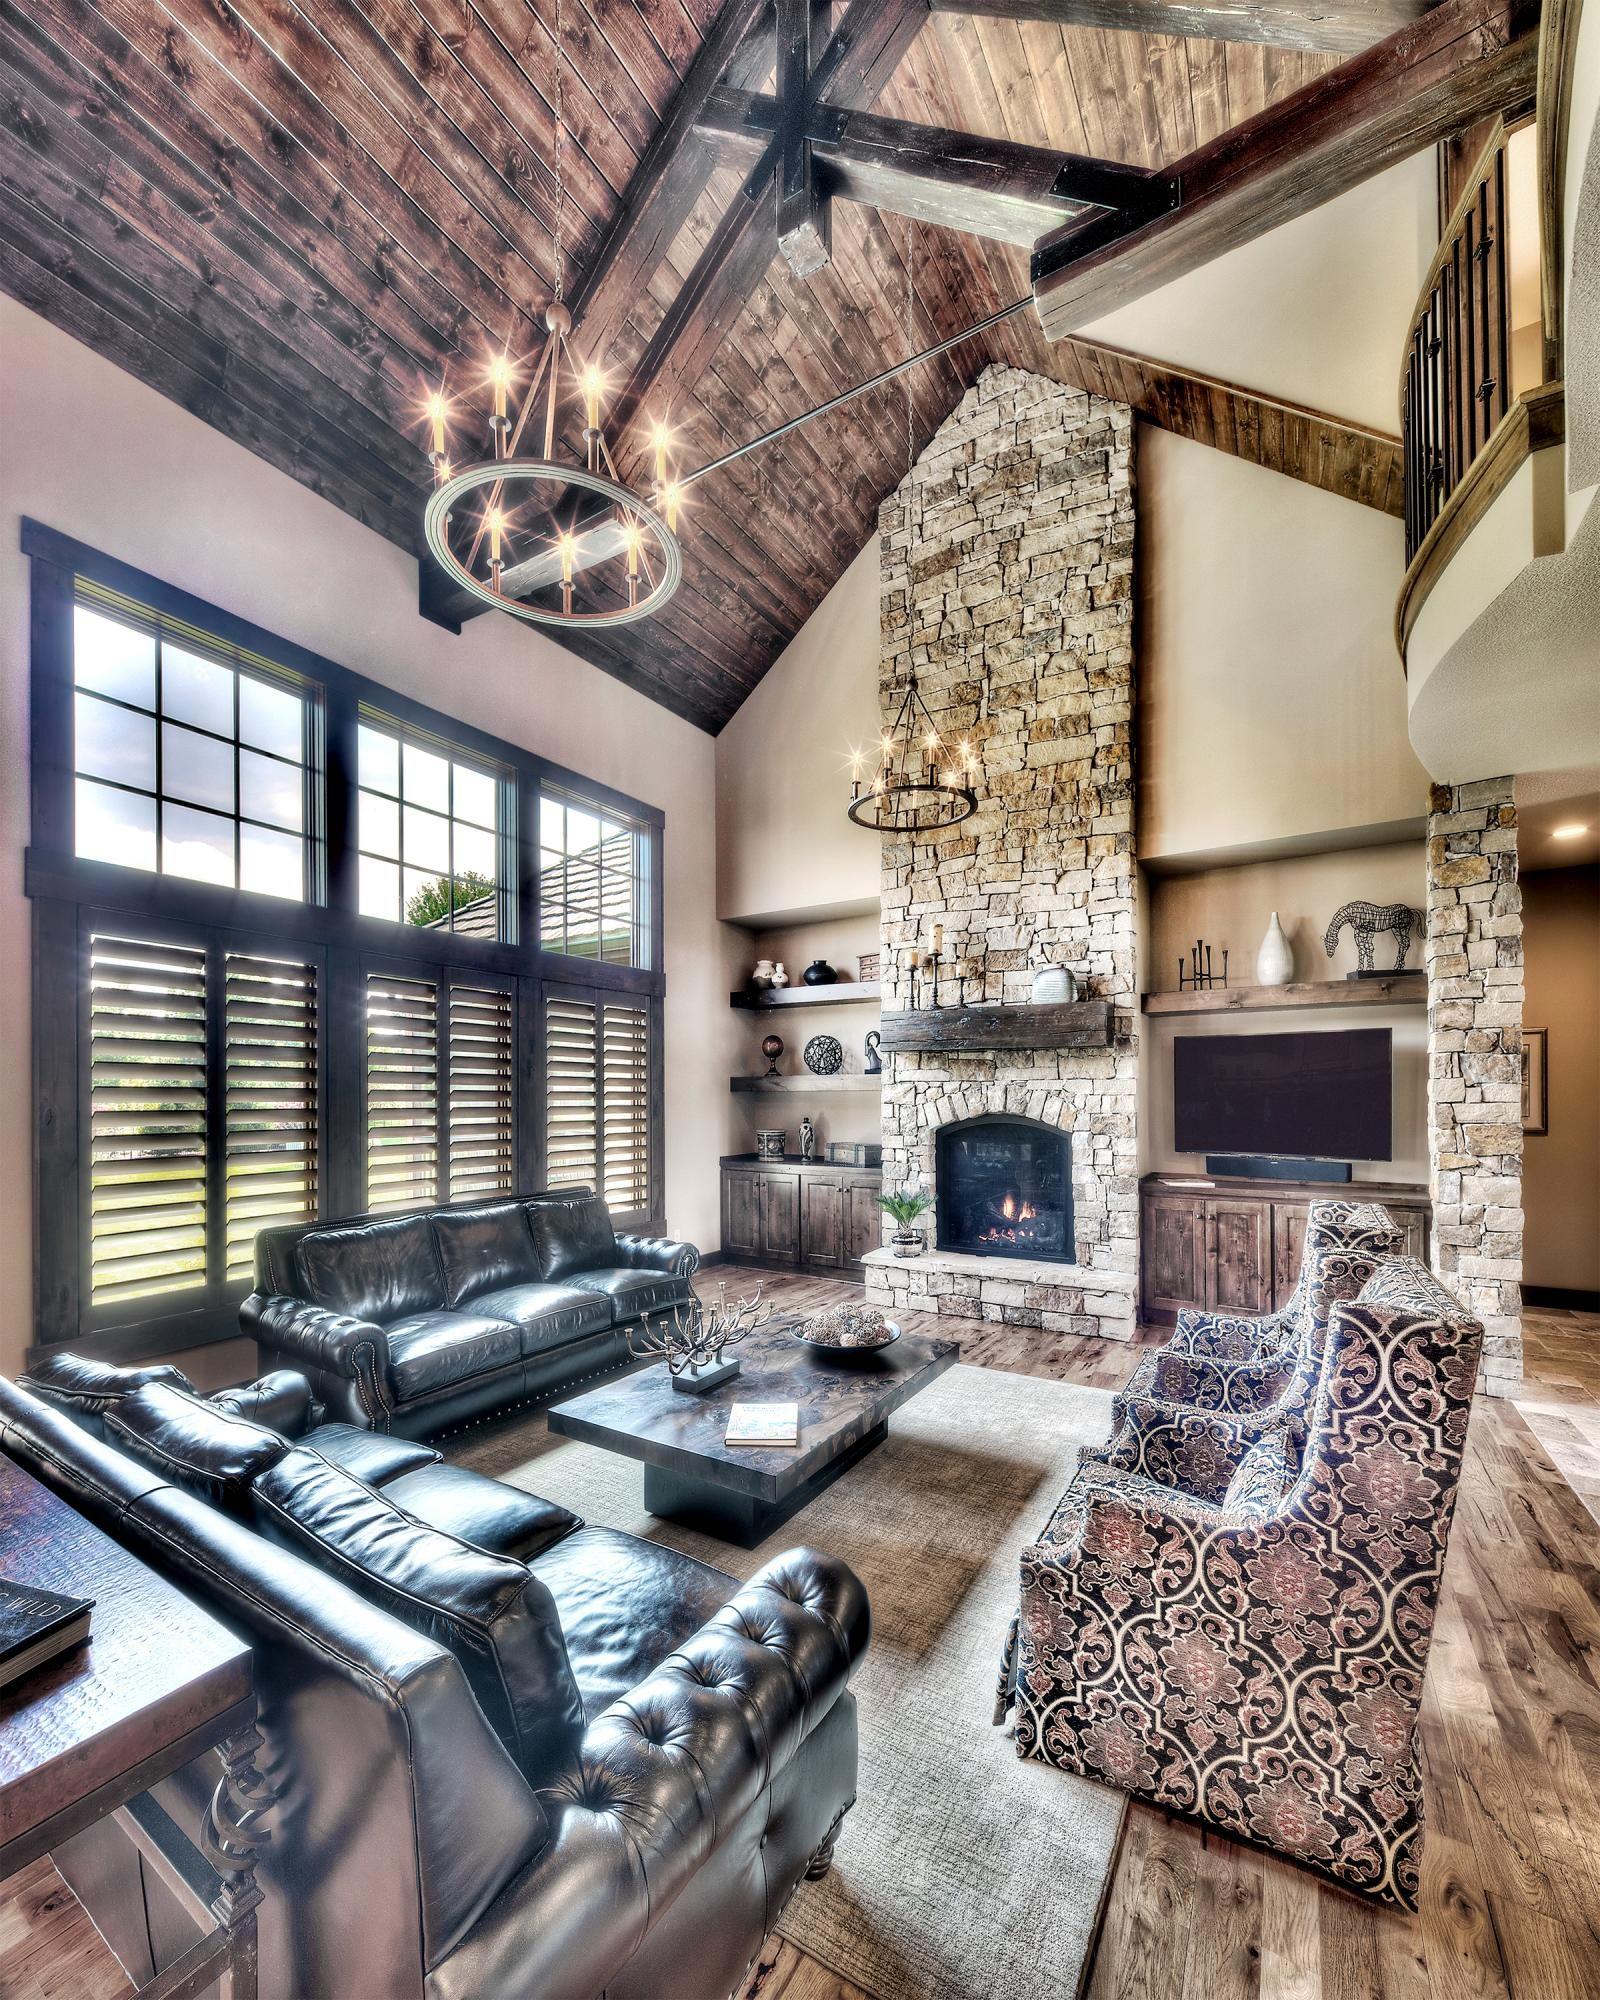 Hearthrooms Photo Gallery Custom Homes In Kansas City Ks Starr Homes Home House Home Living Room